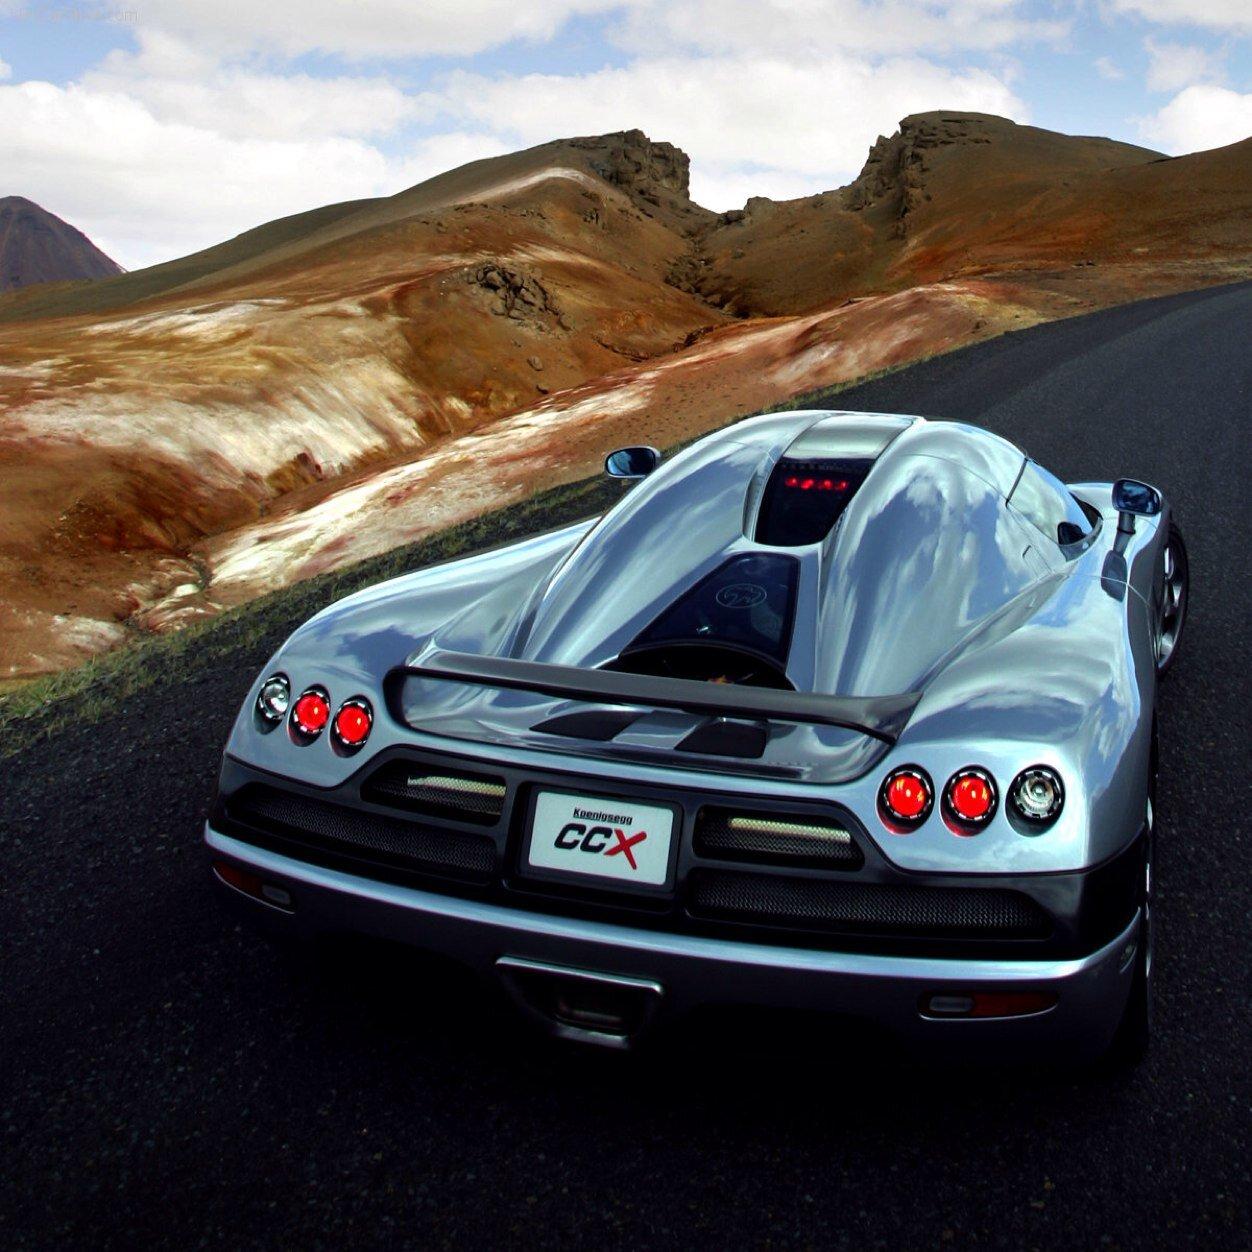 Koenigsegg Ccxr Trevita >> Sweet Cars Daily (@SweetCars_Daily) | Twitter